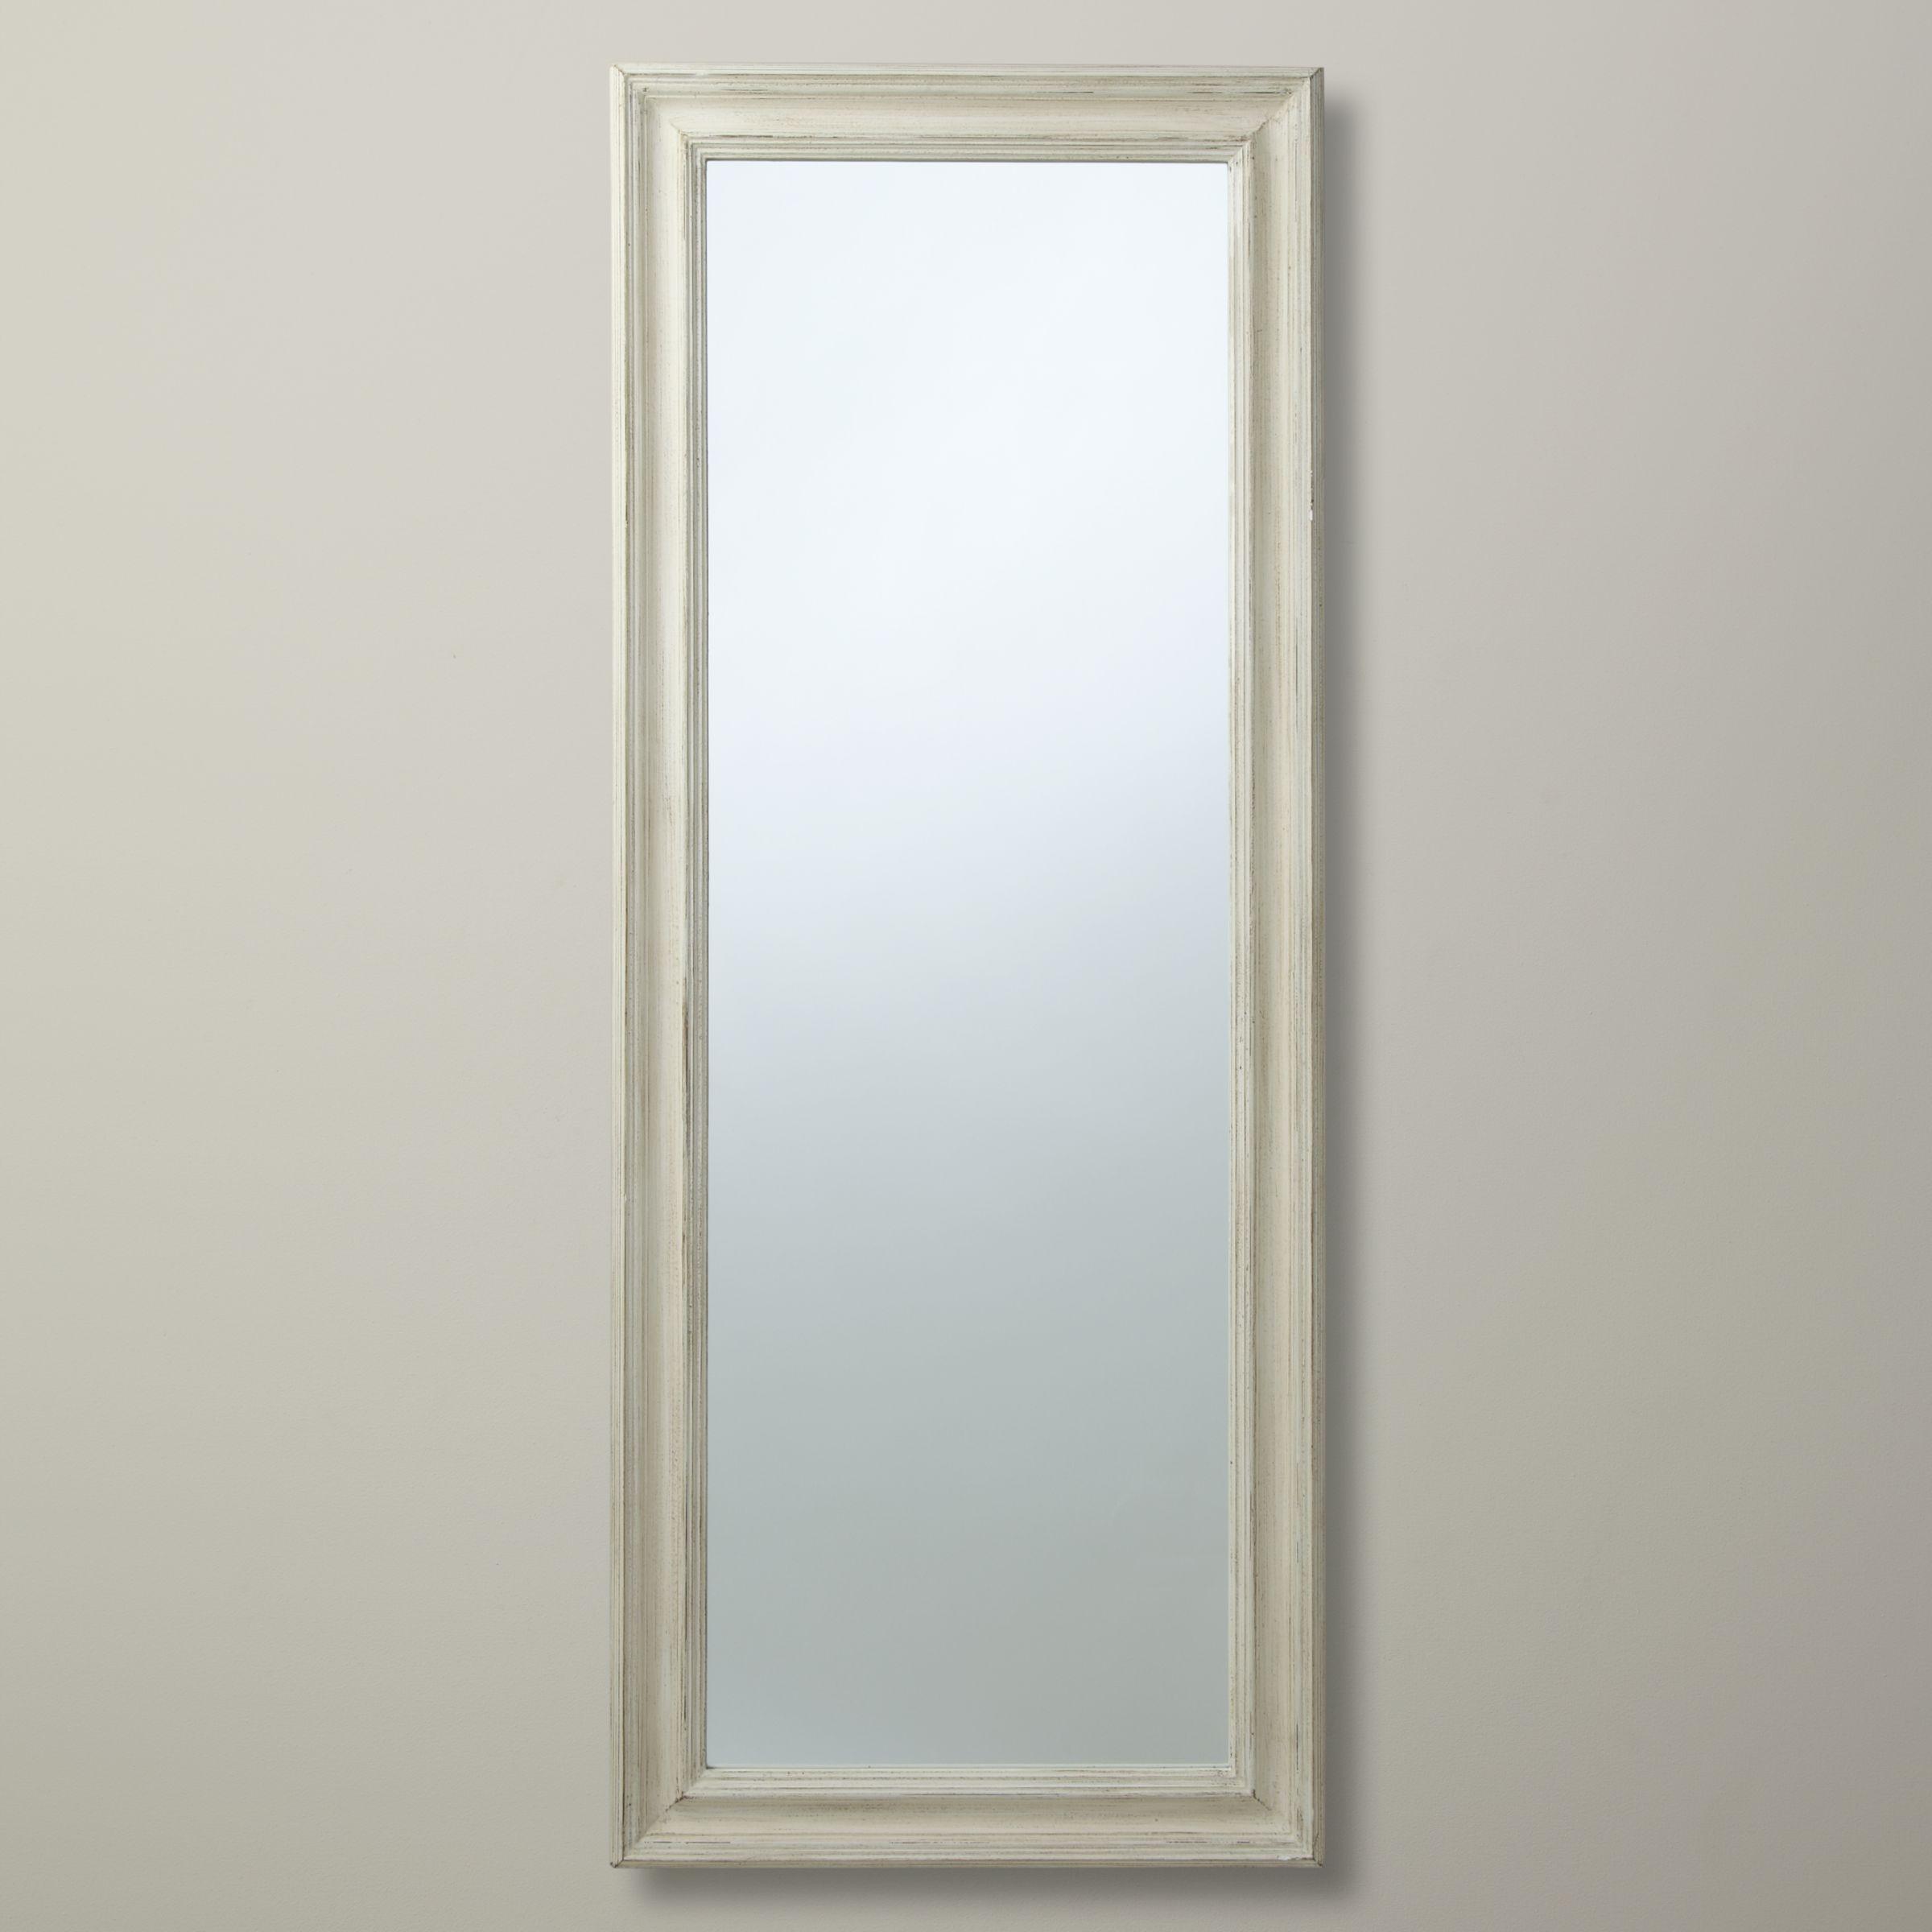 John Lewis & Partners Distressed Full Length Mirror, 132 x 52cm, Cream